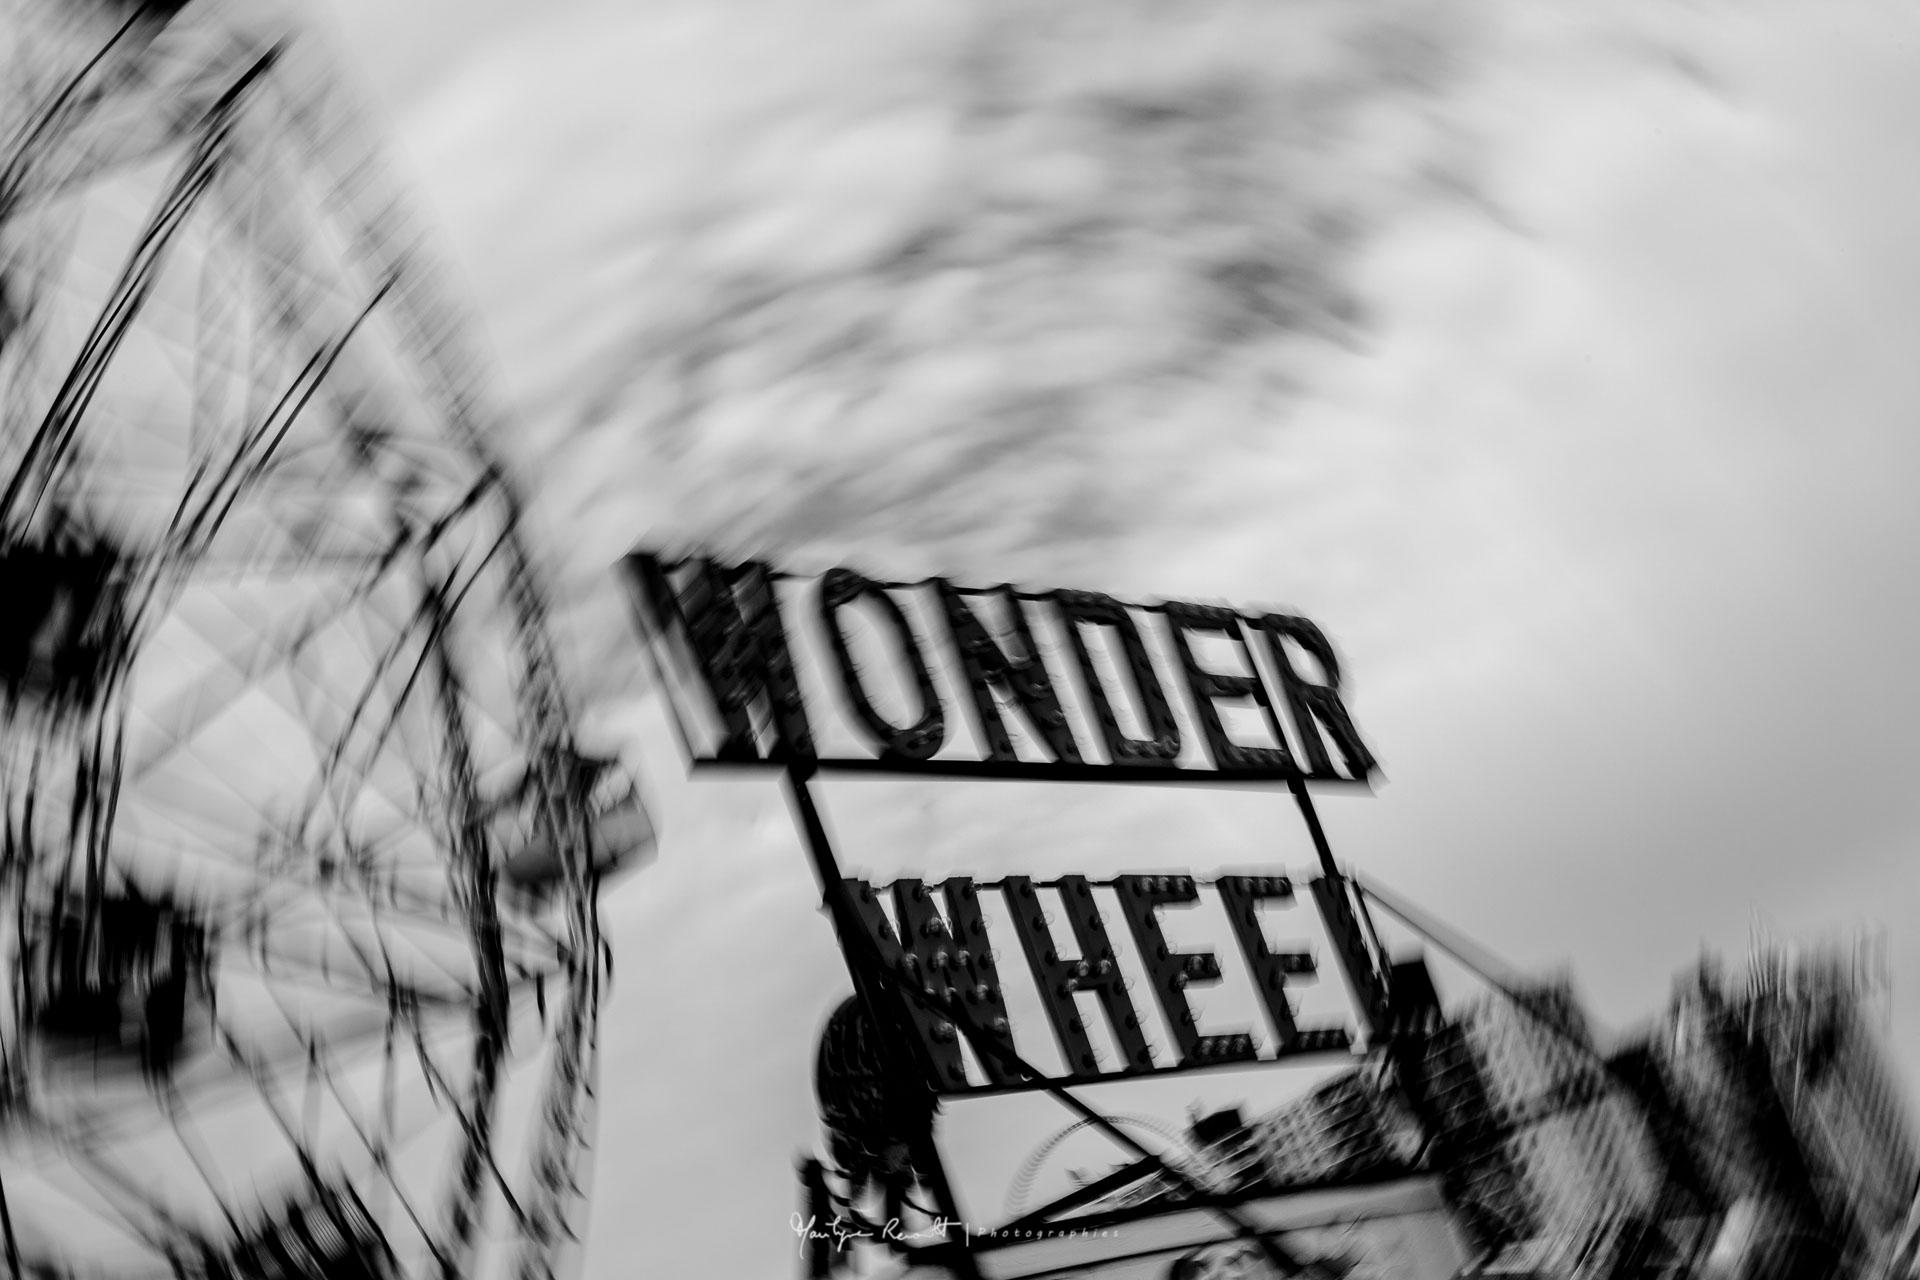 2016-coney island-9940